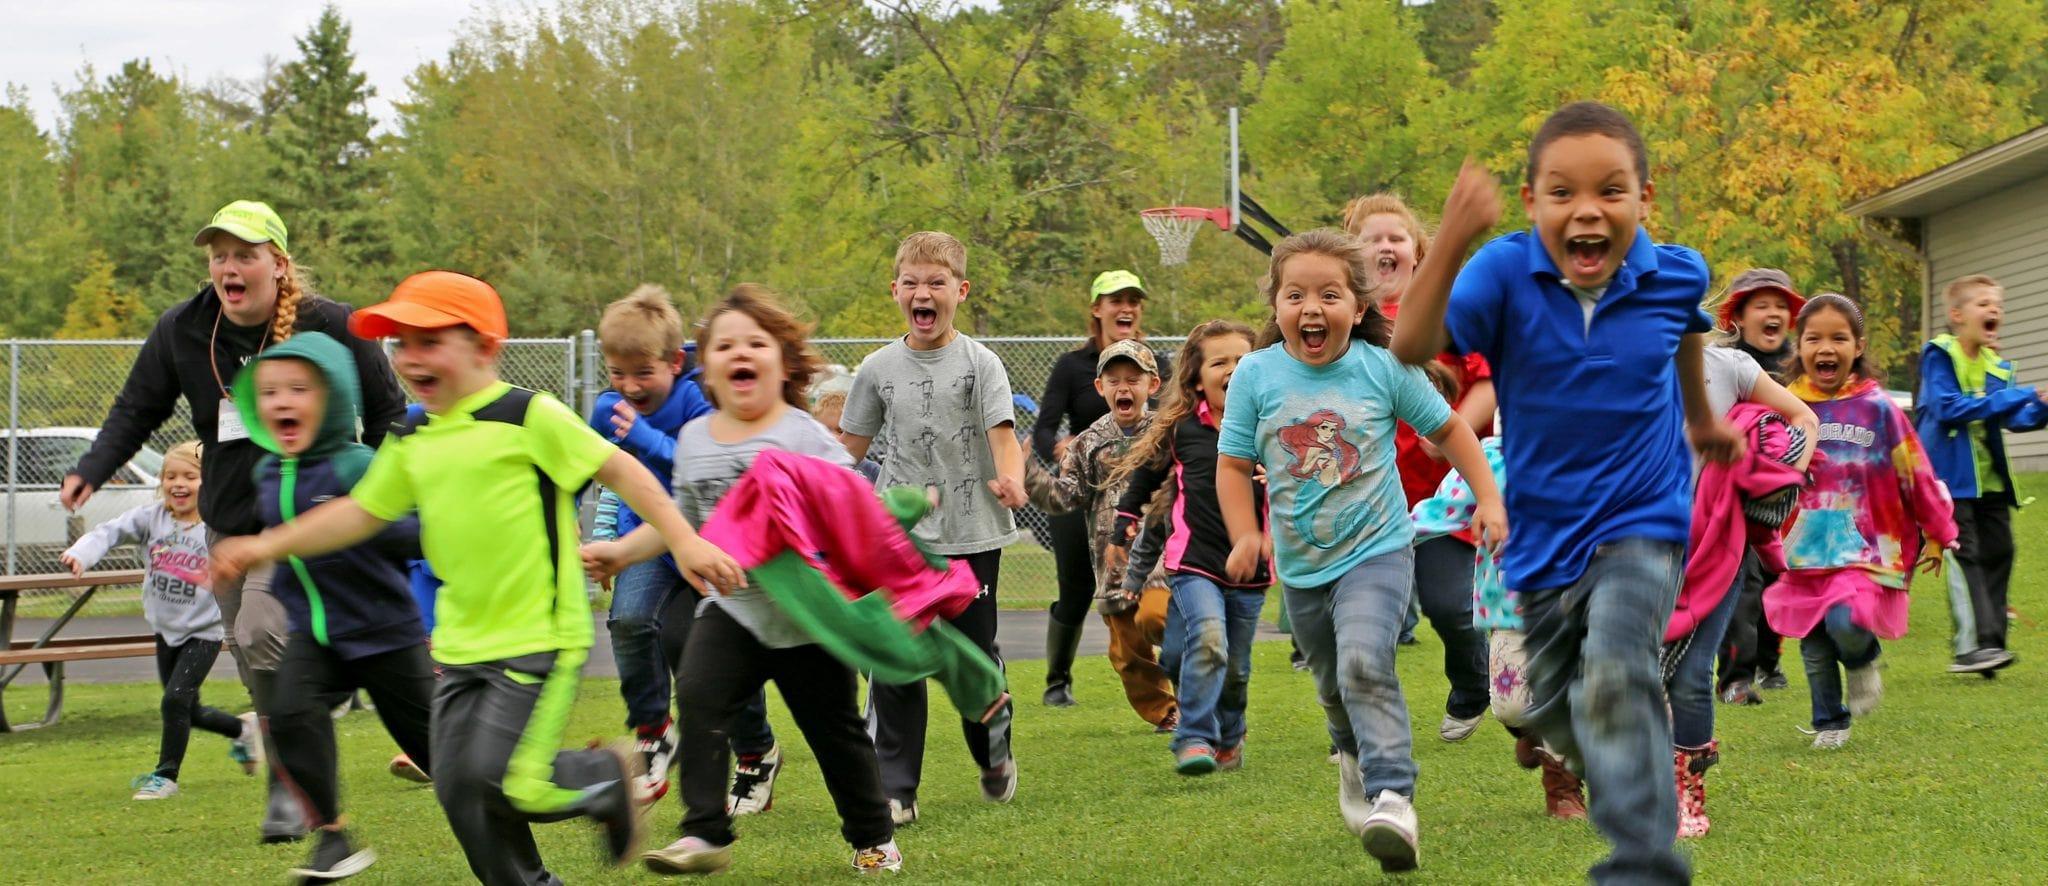 Excited children run toi Canoemobile